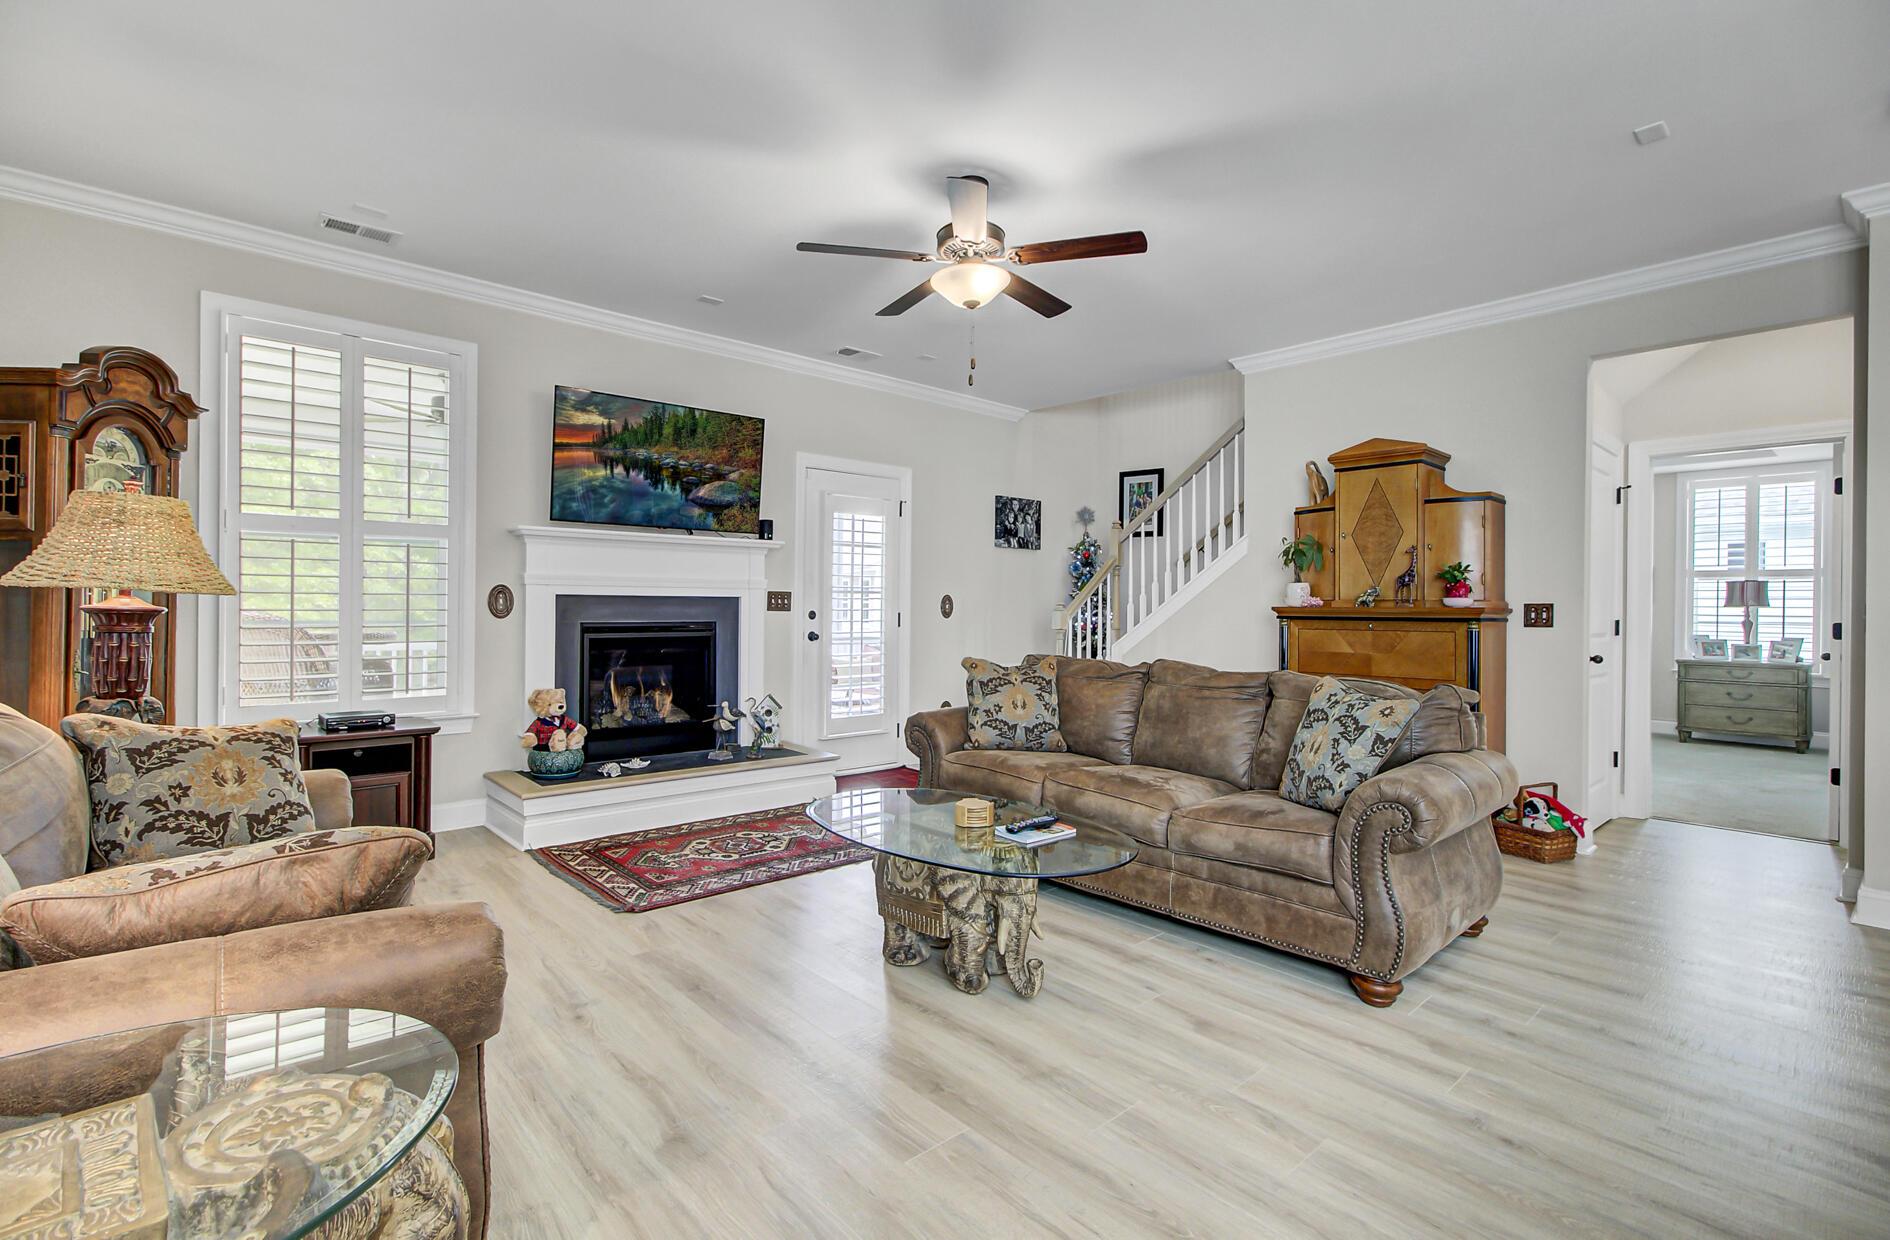 Park West Homes For Sale - 2824 Wagner, Mount Pleasant, SC - 16